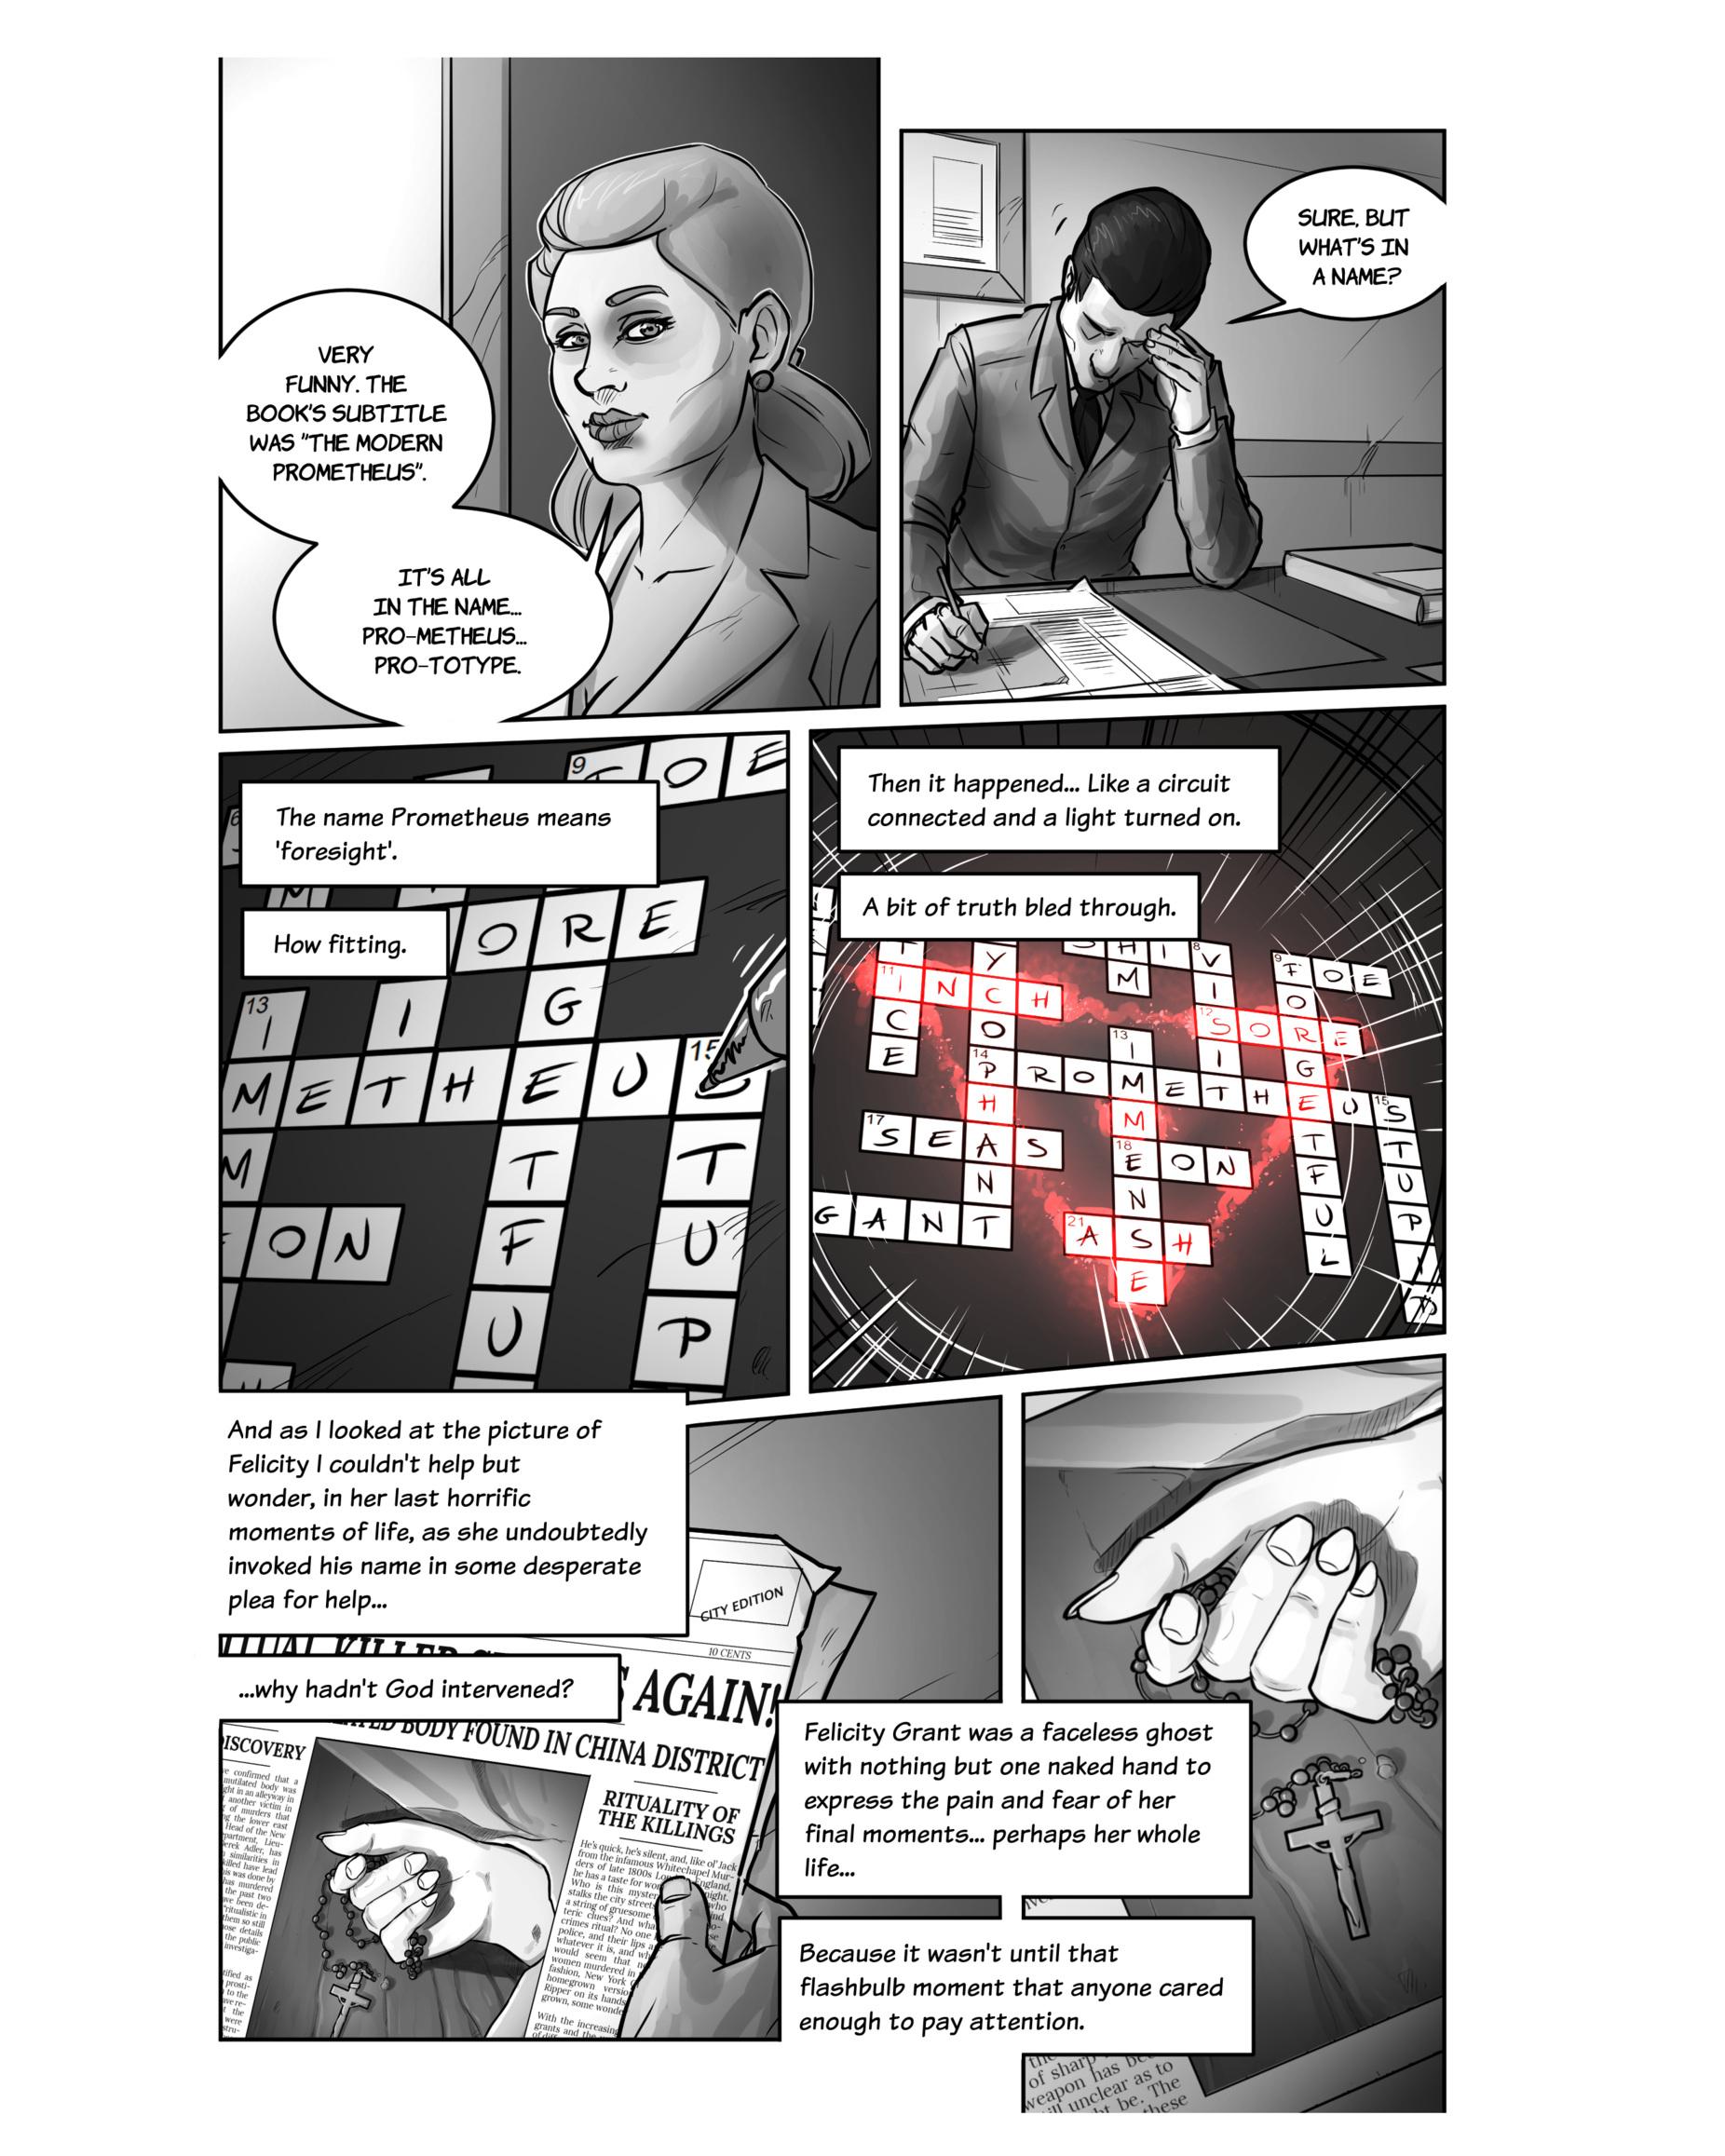 owatw_1+PAGE+21+WEB.jpg